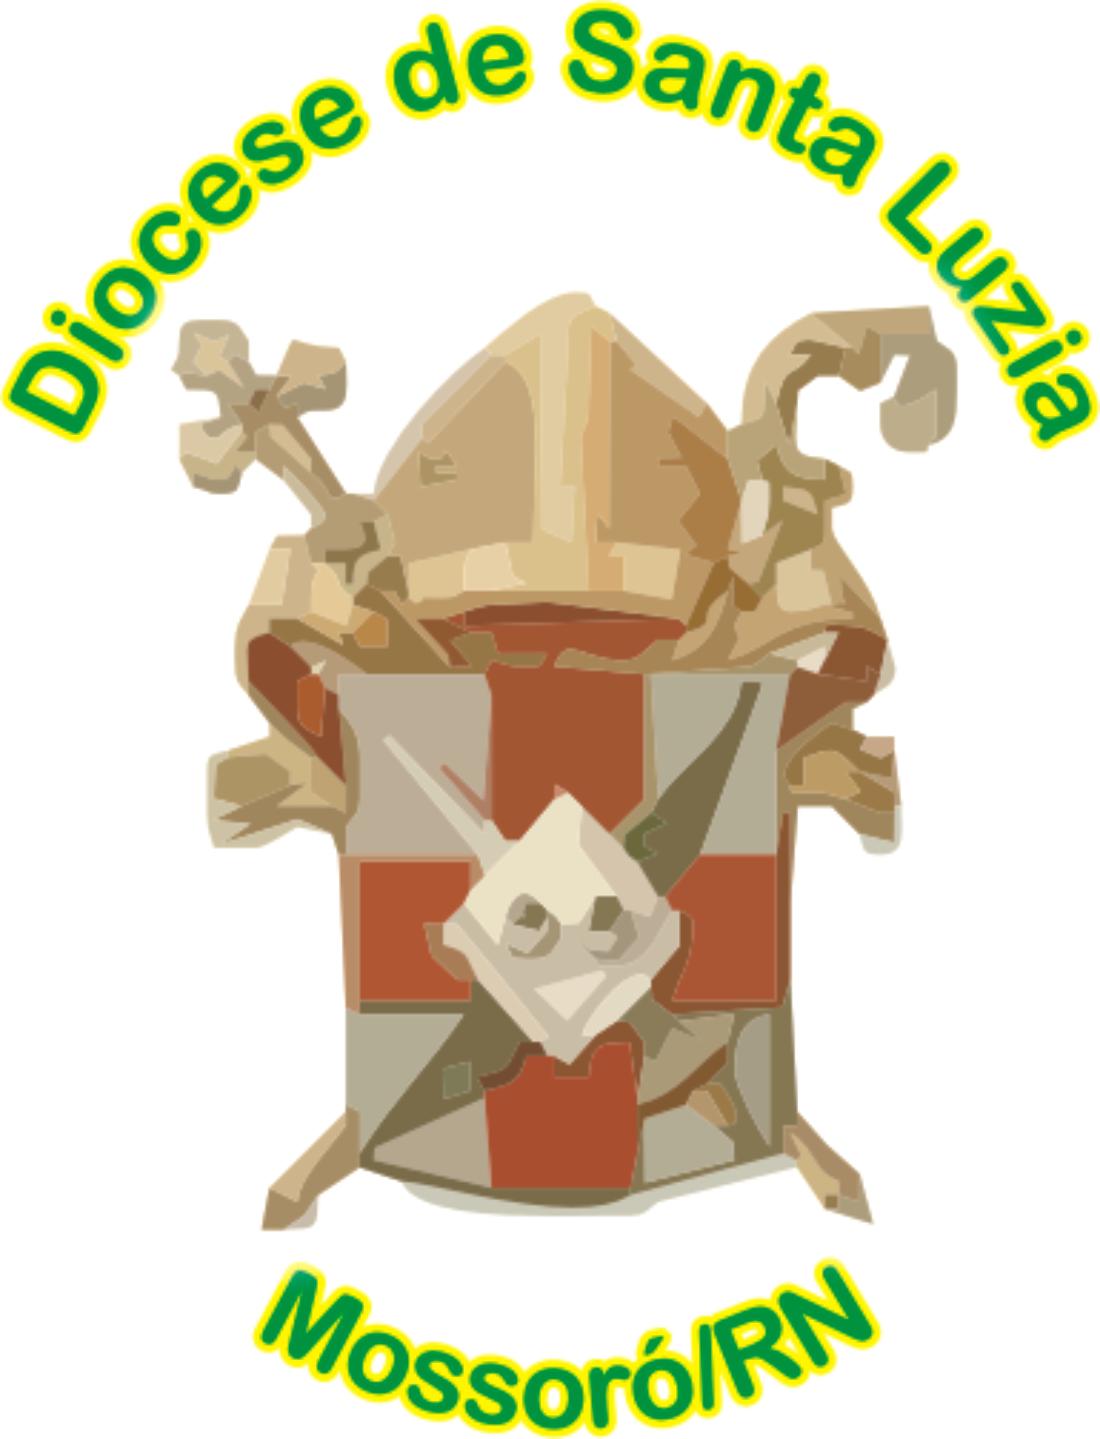 Diocese de Santa Luzia — Mossoró, RN: ZONAL MOSSORÓ II.